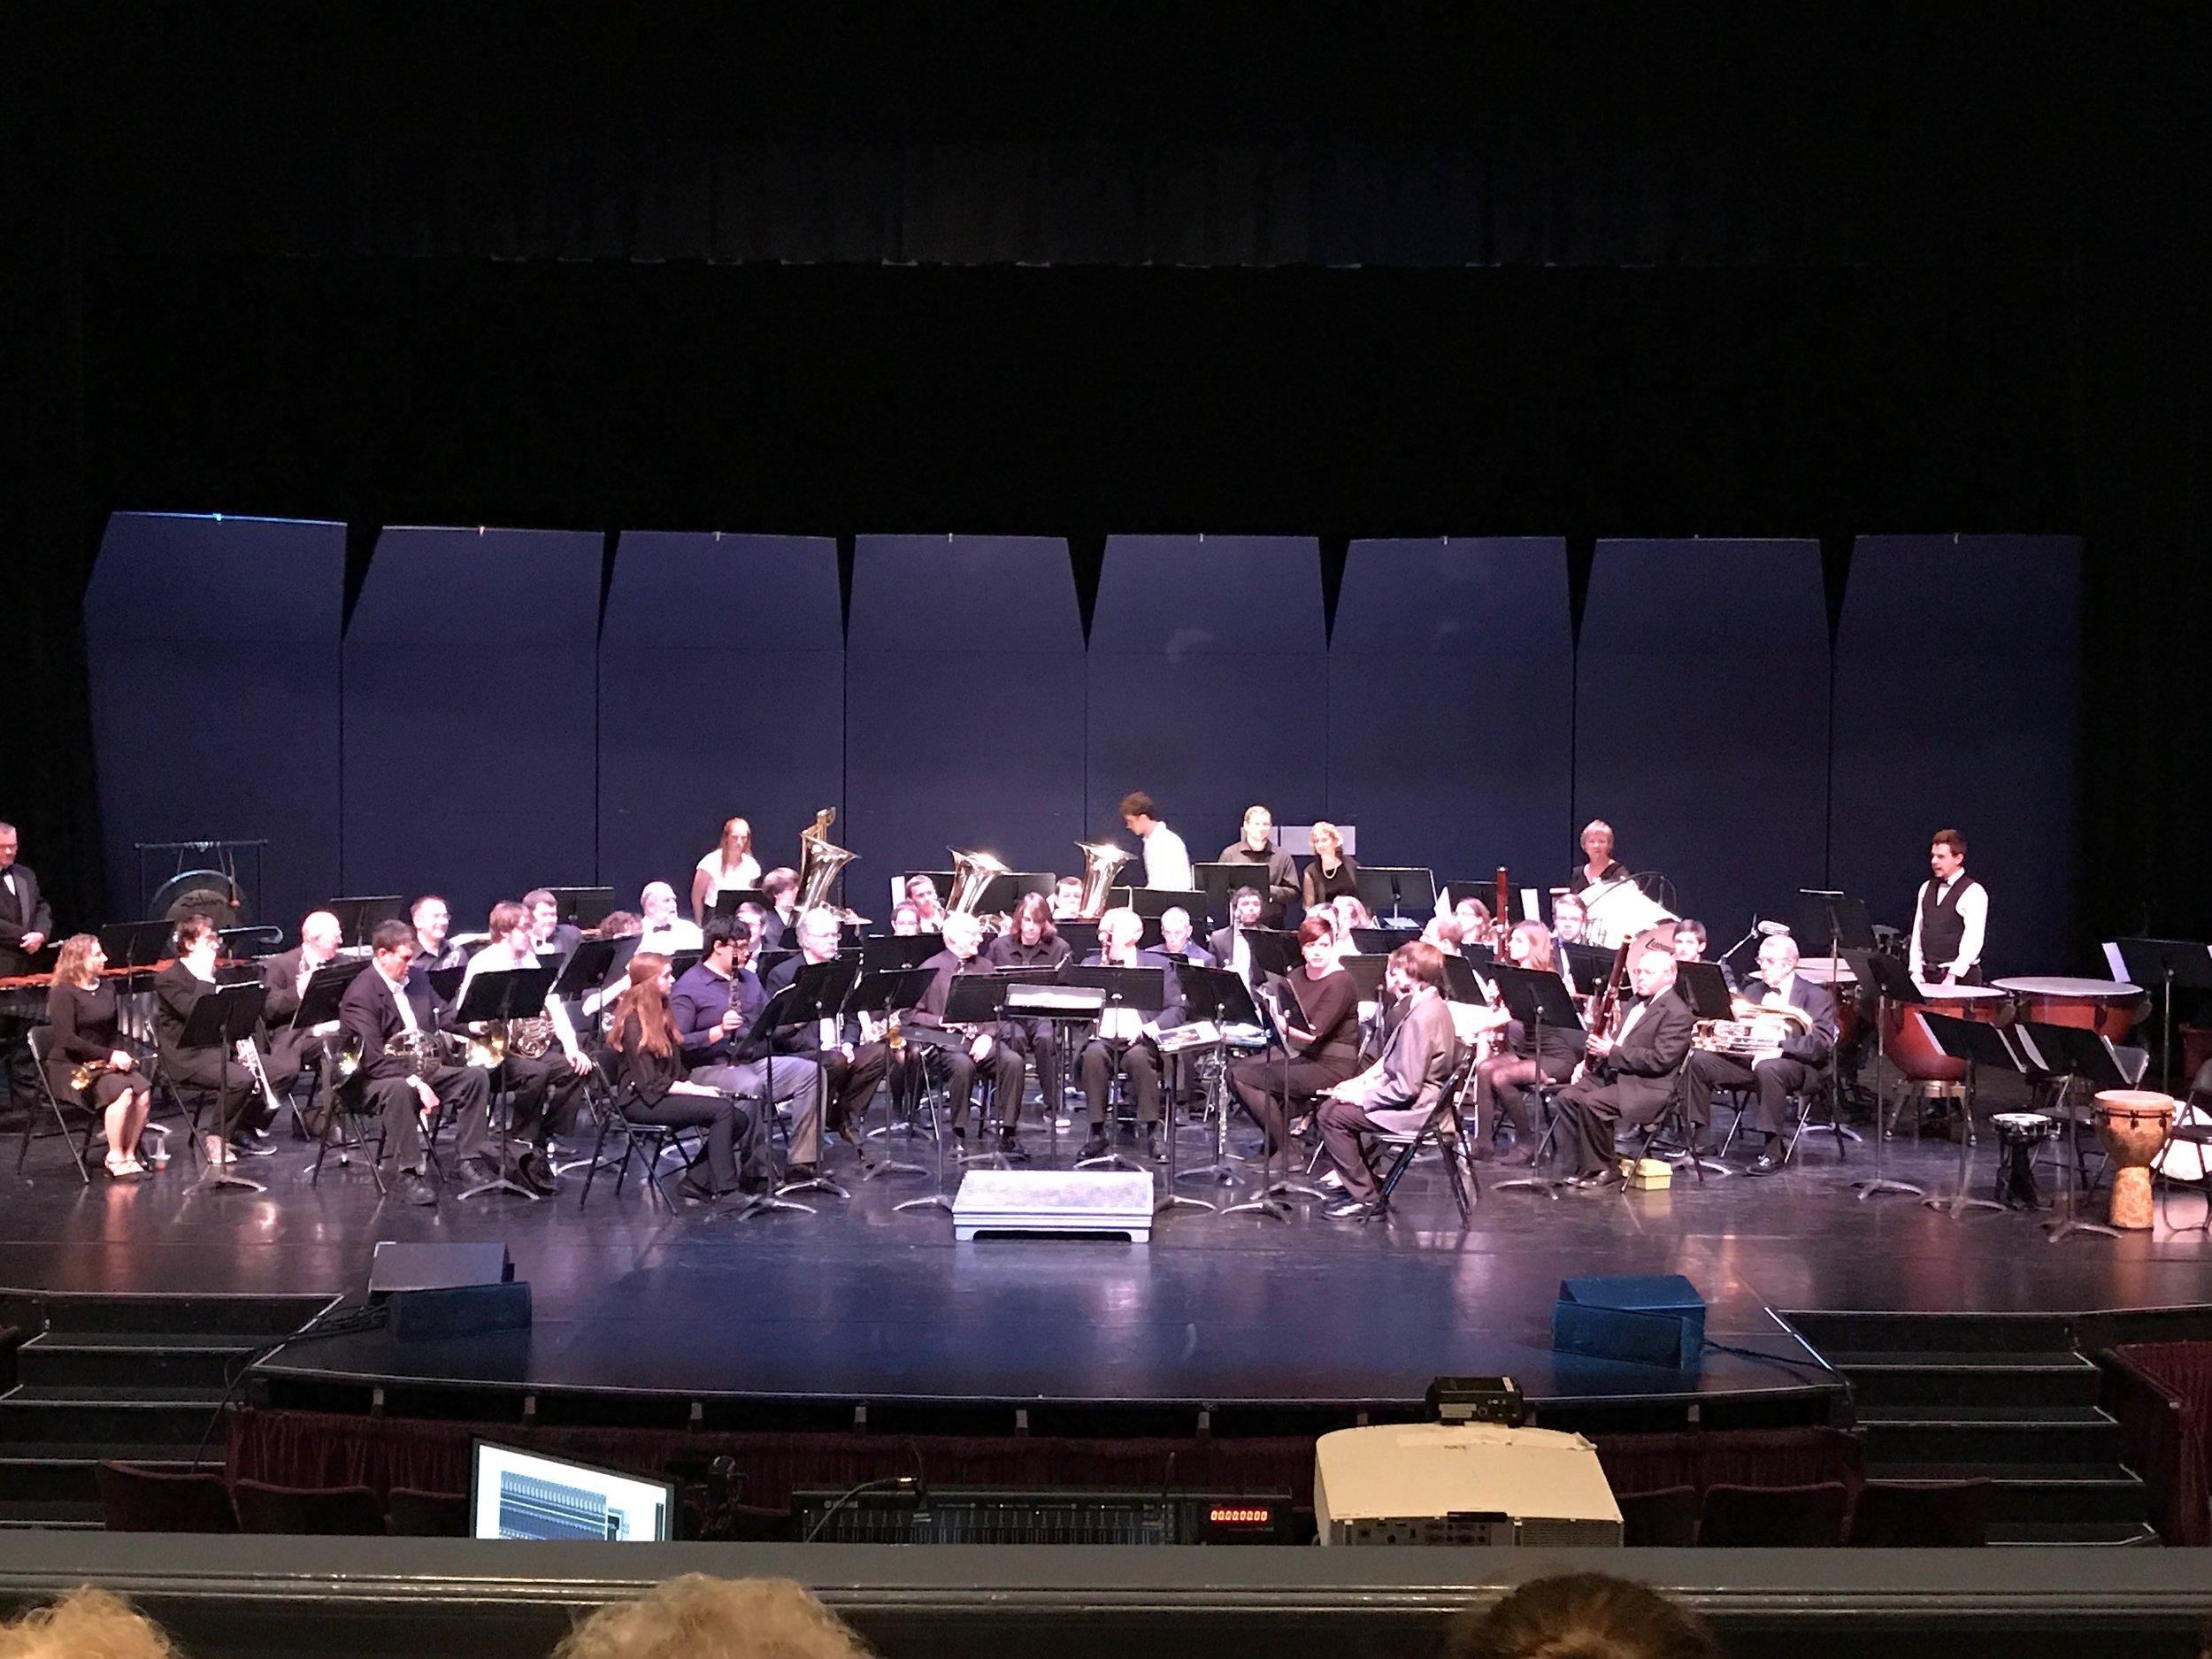 The Klamath Falls Community Band at the Ross Ragland Theater